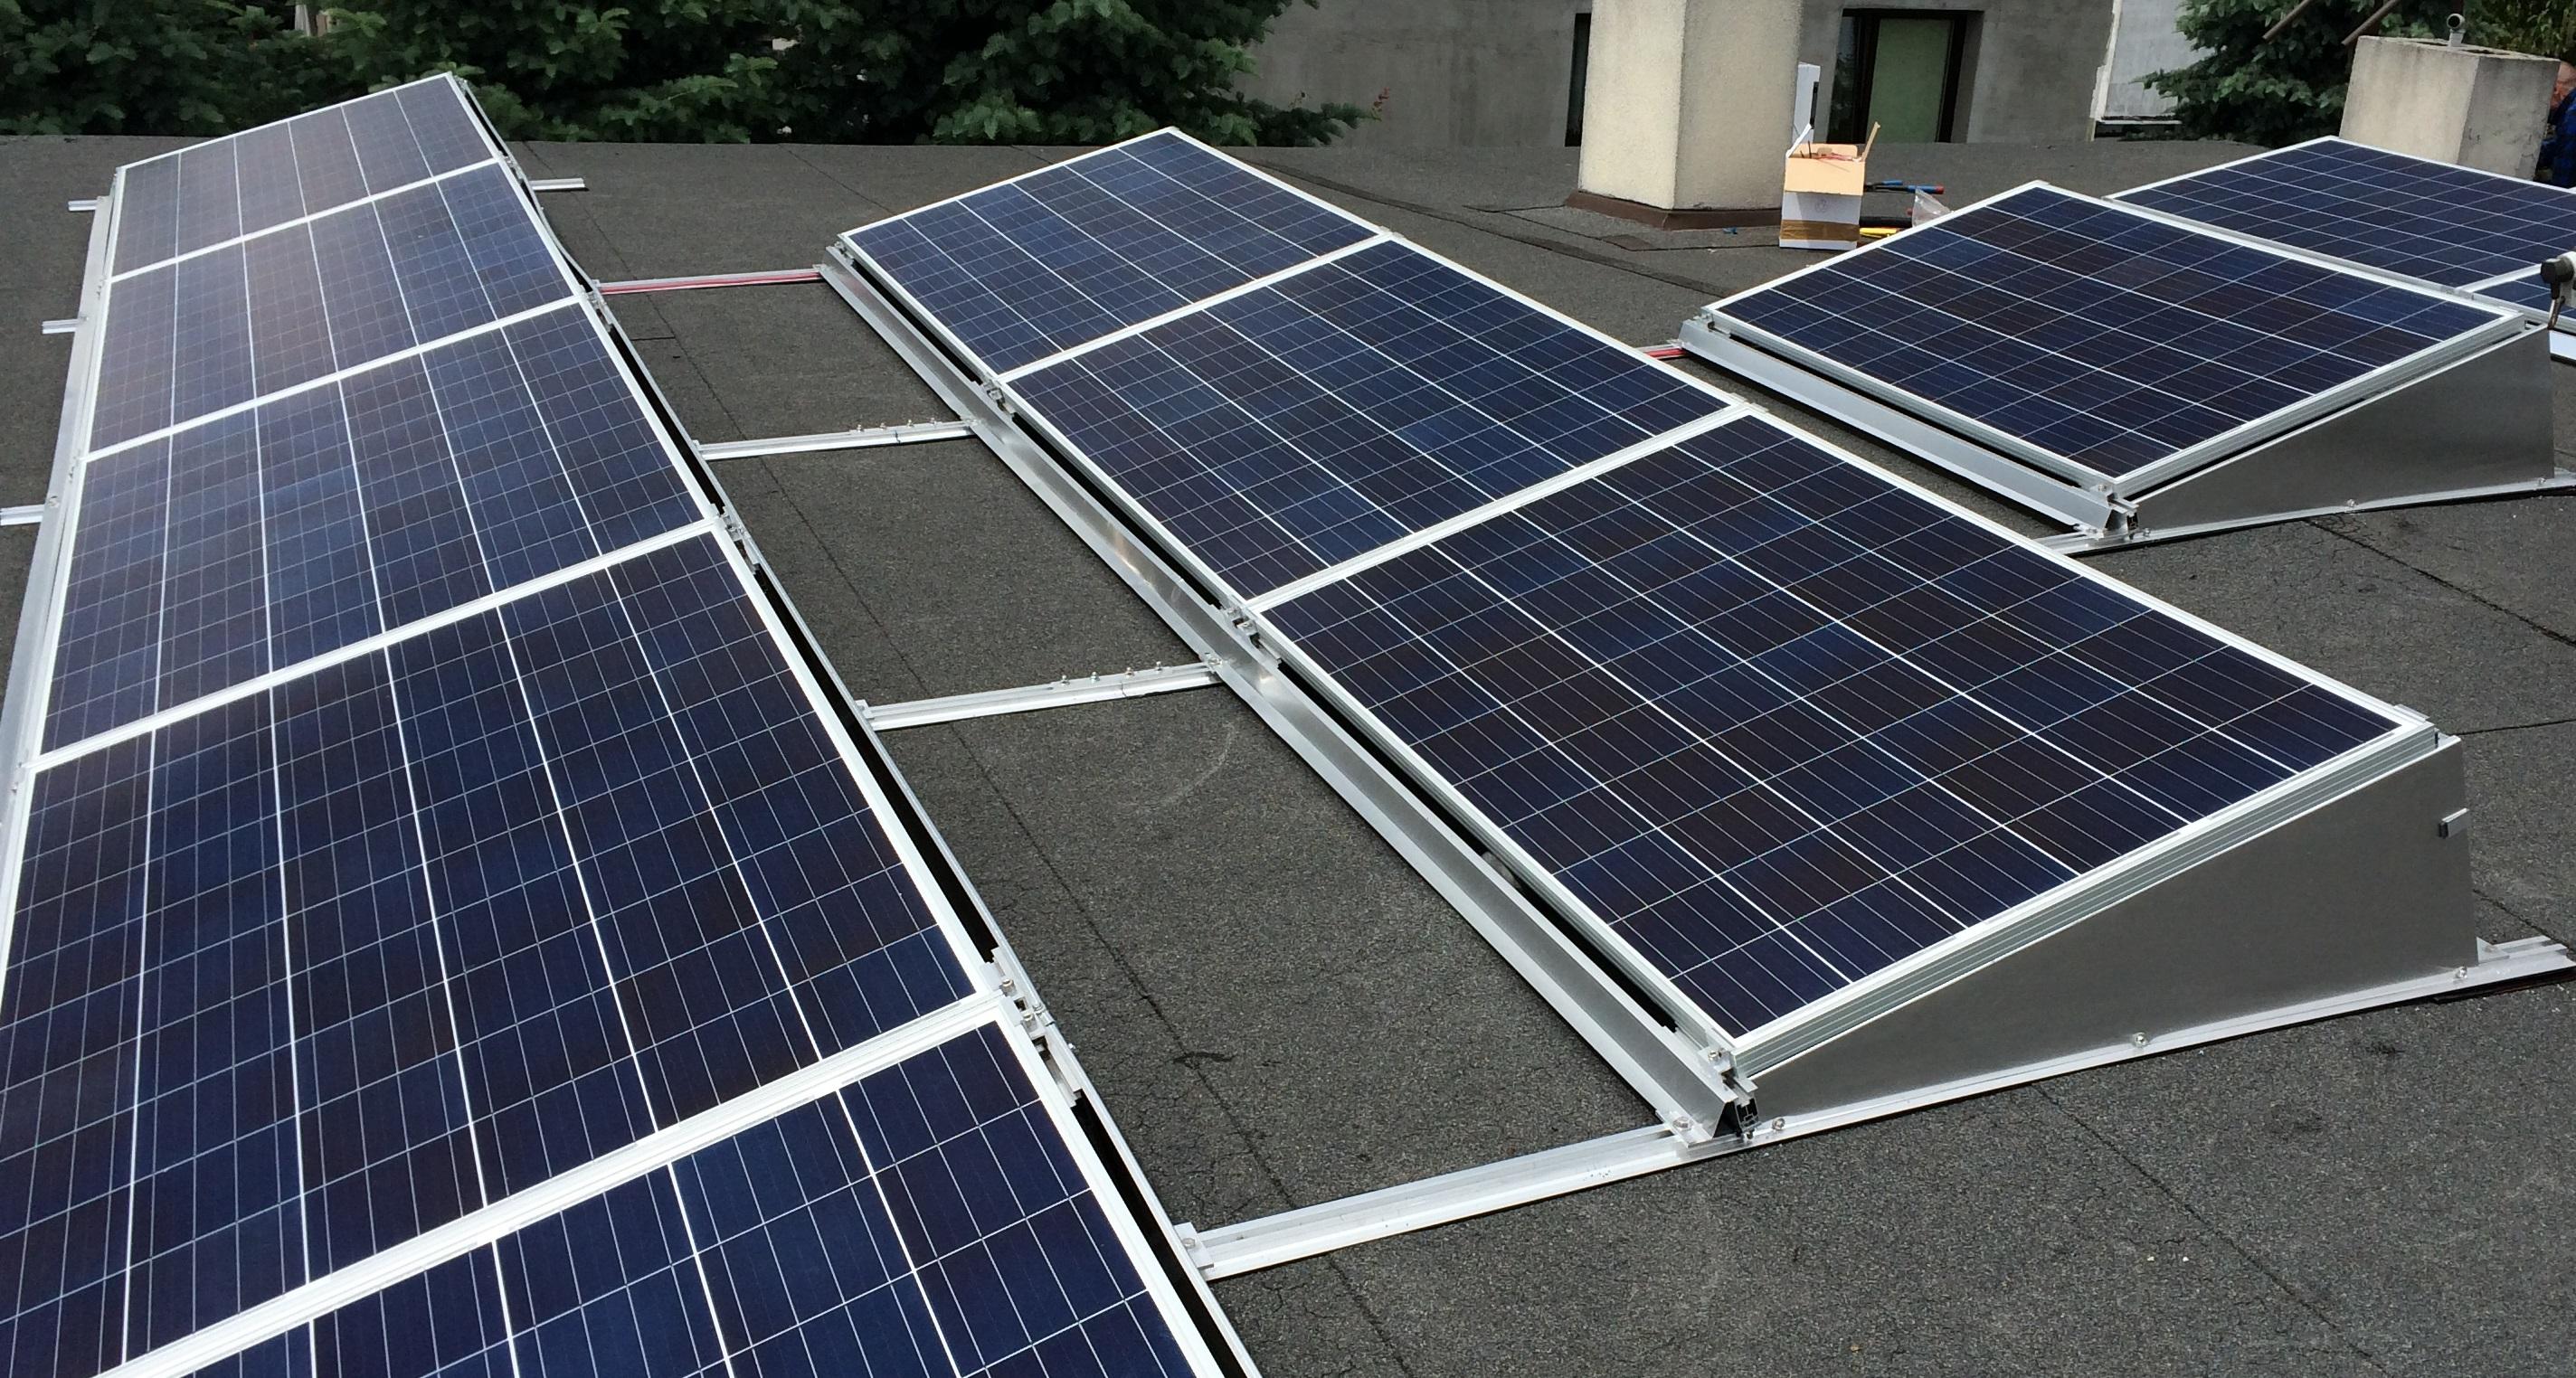 Tarnowskie Góry - Moc 6 kWp On-grid